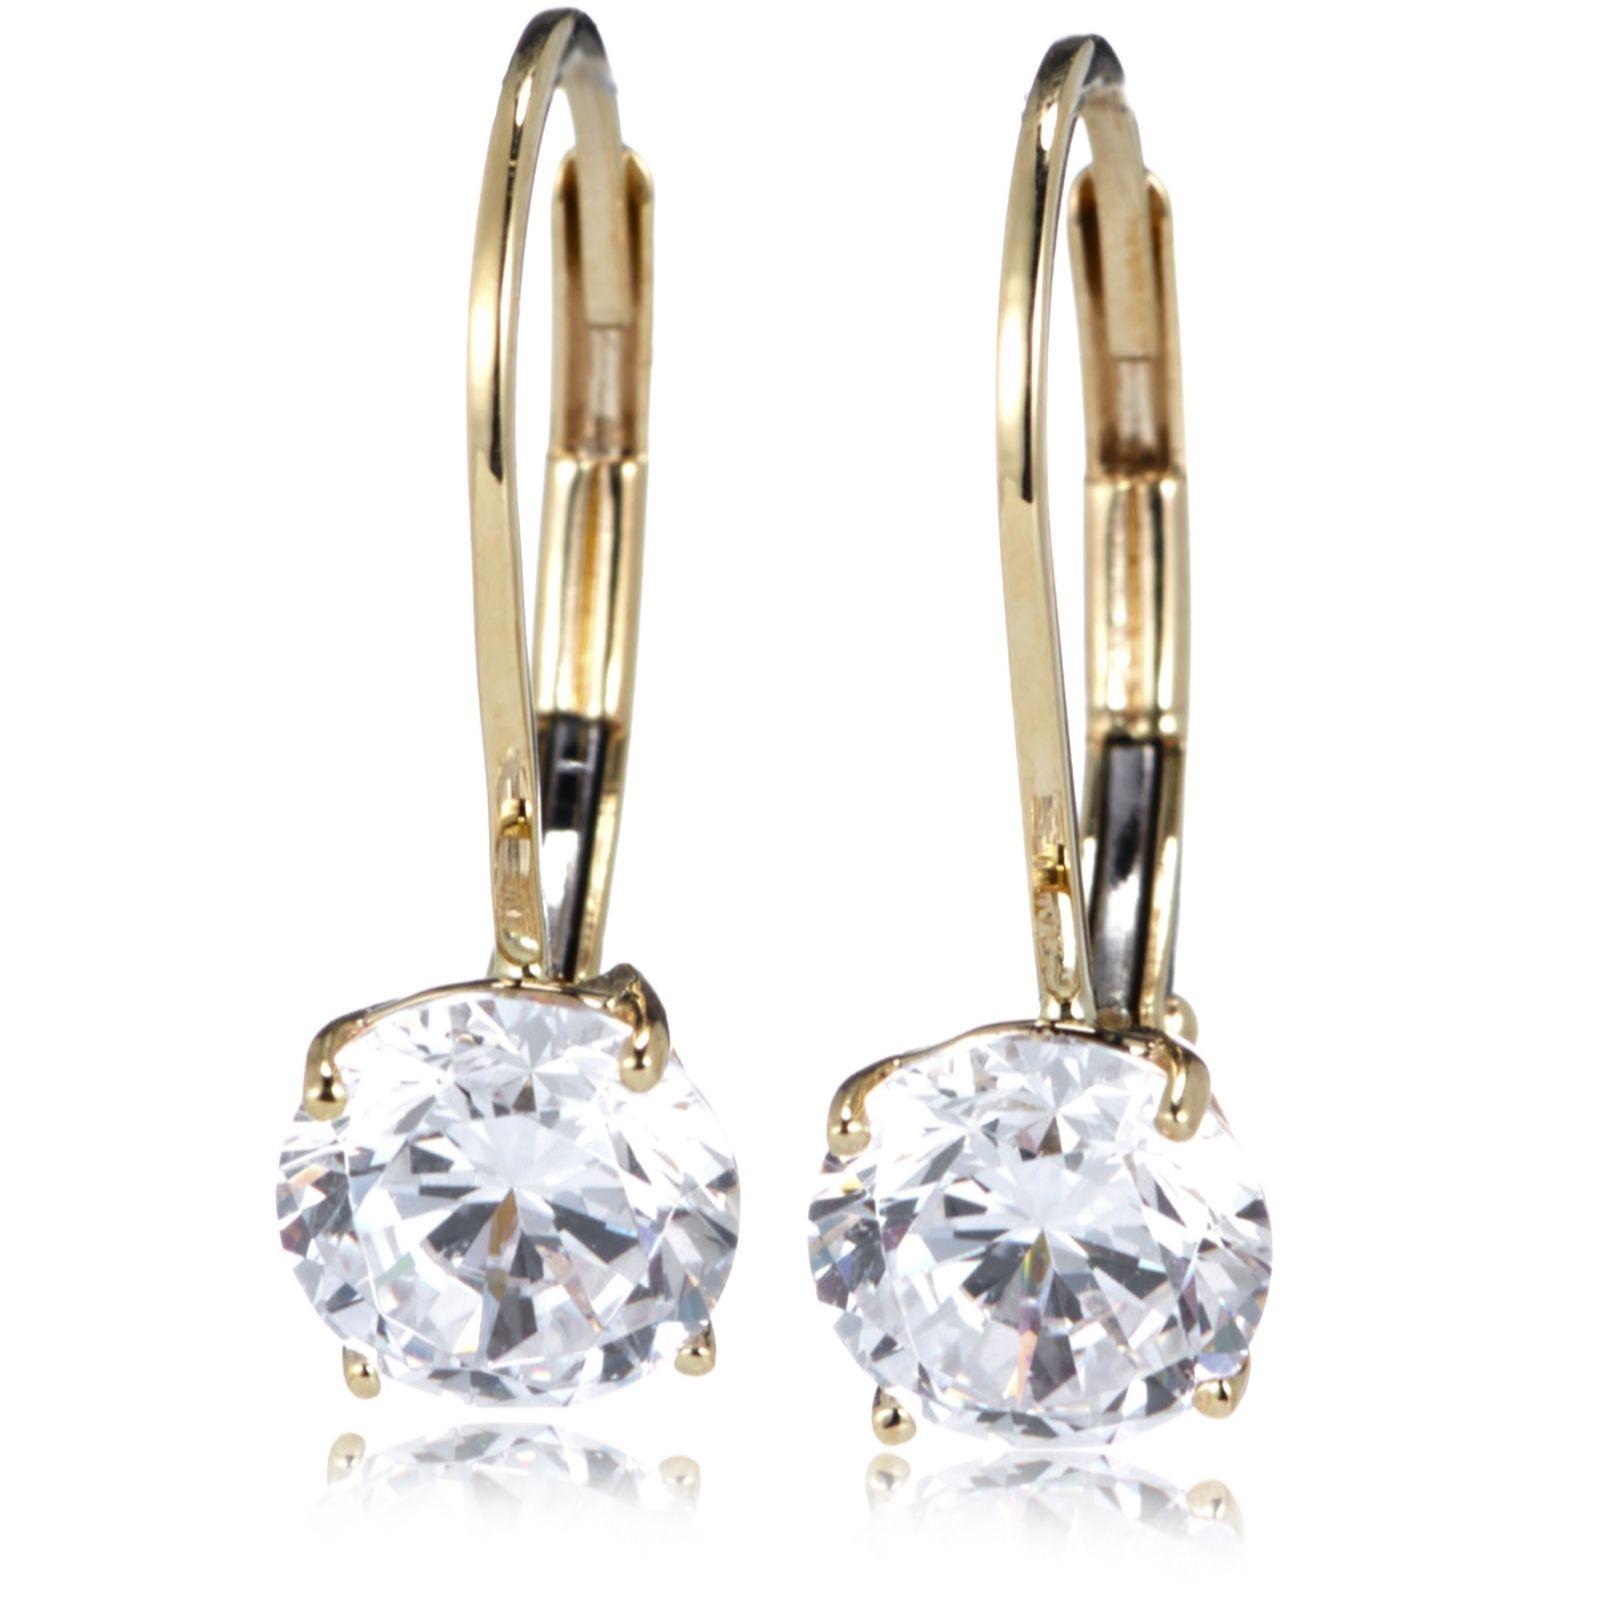 Diamonique 2ct tw Leverback Earrings 9ct Gold QVC UK